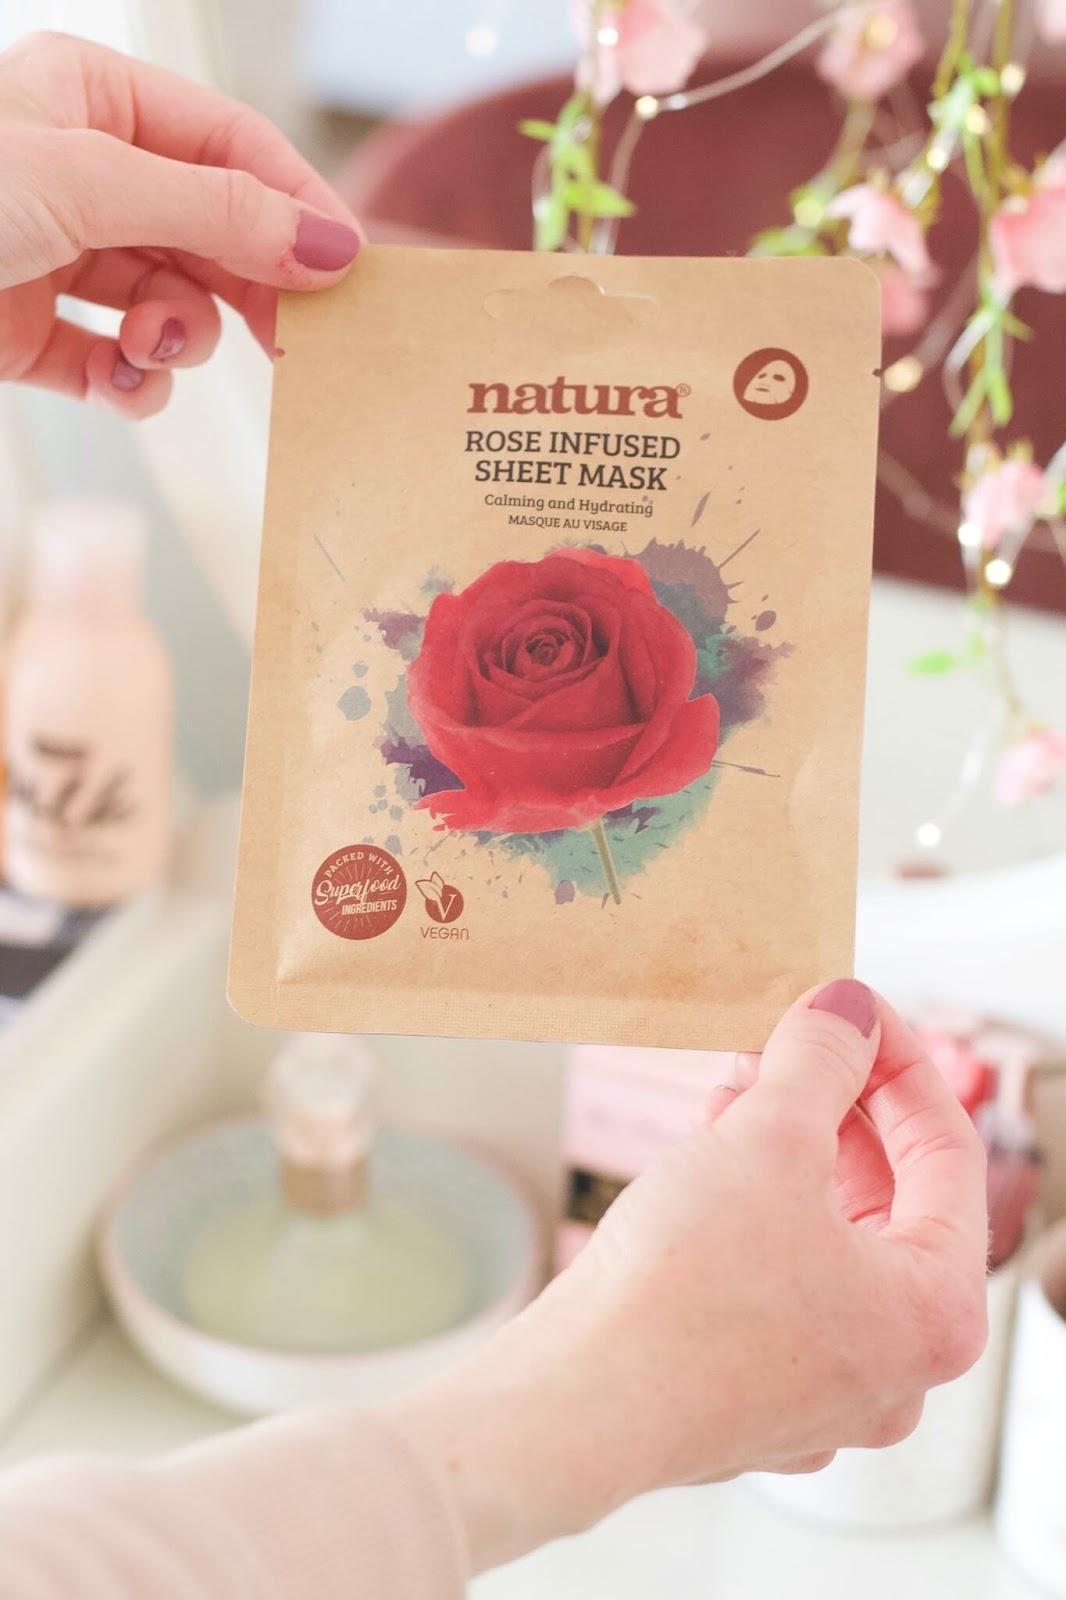 Natura Rose Infused Sheet Mask